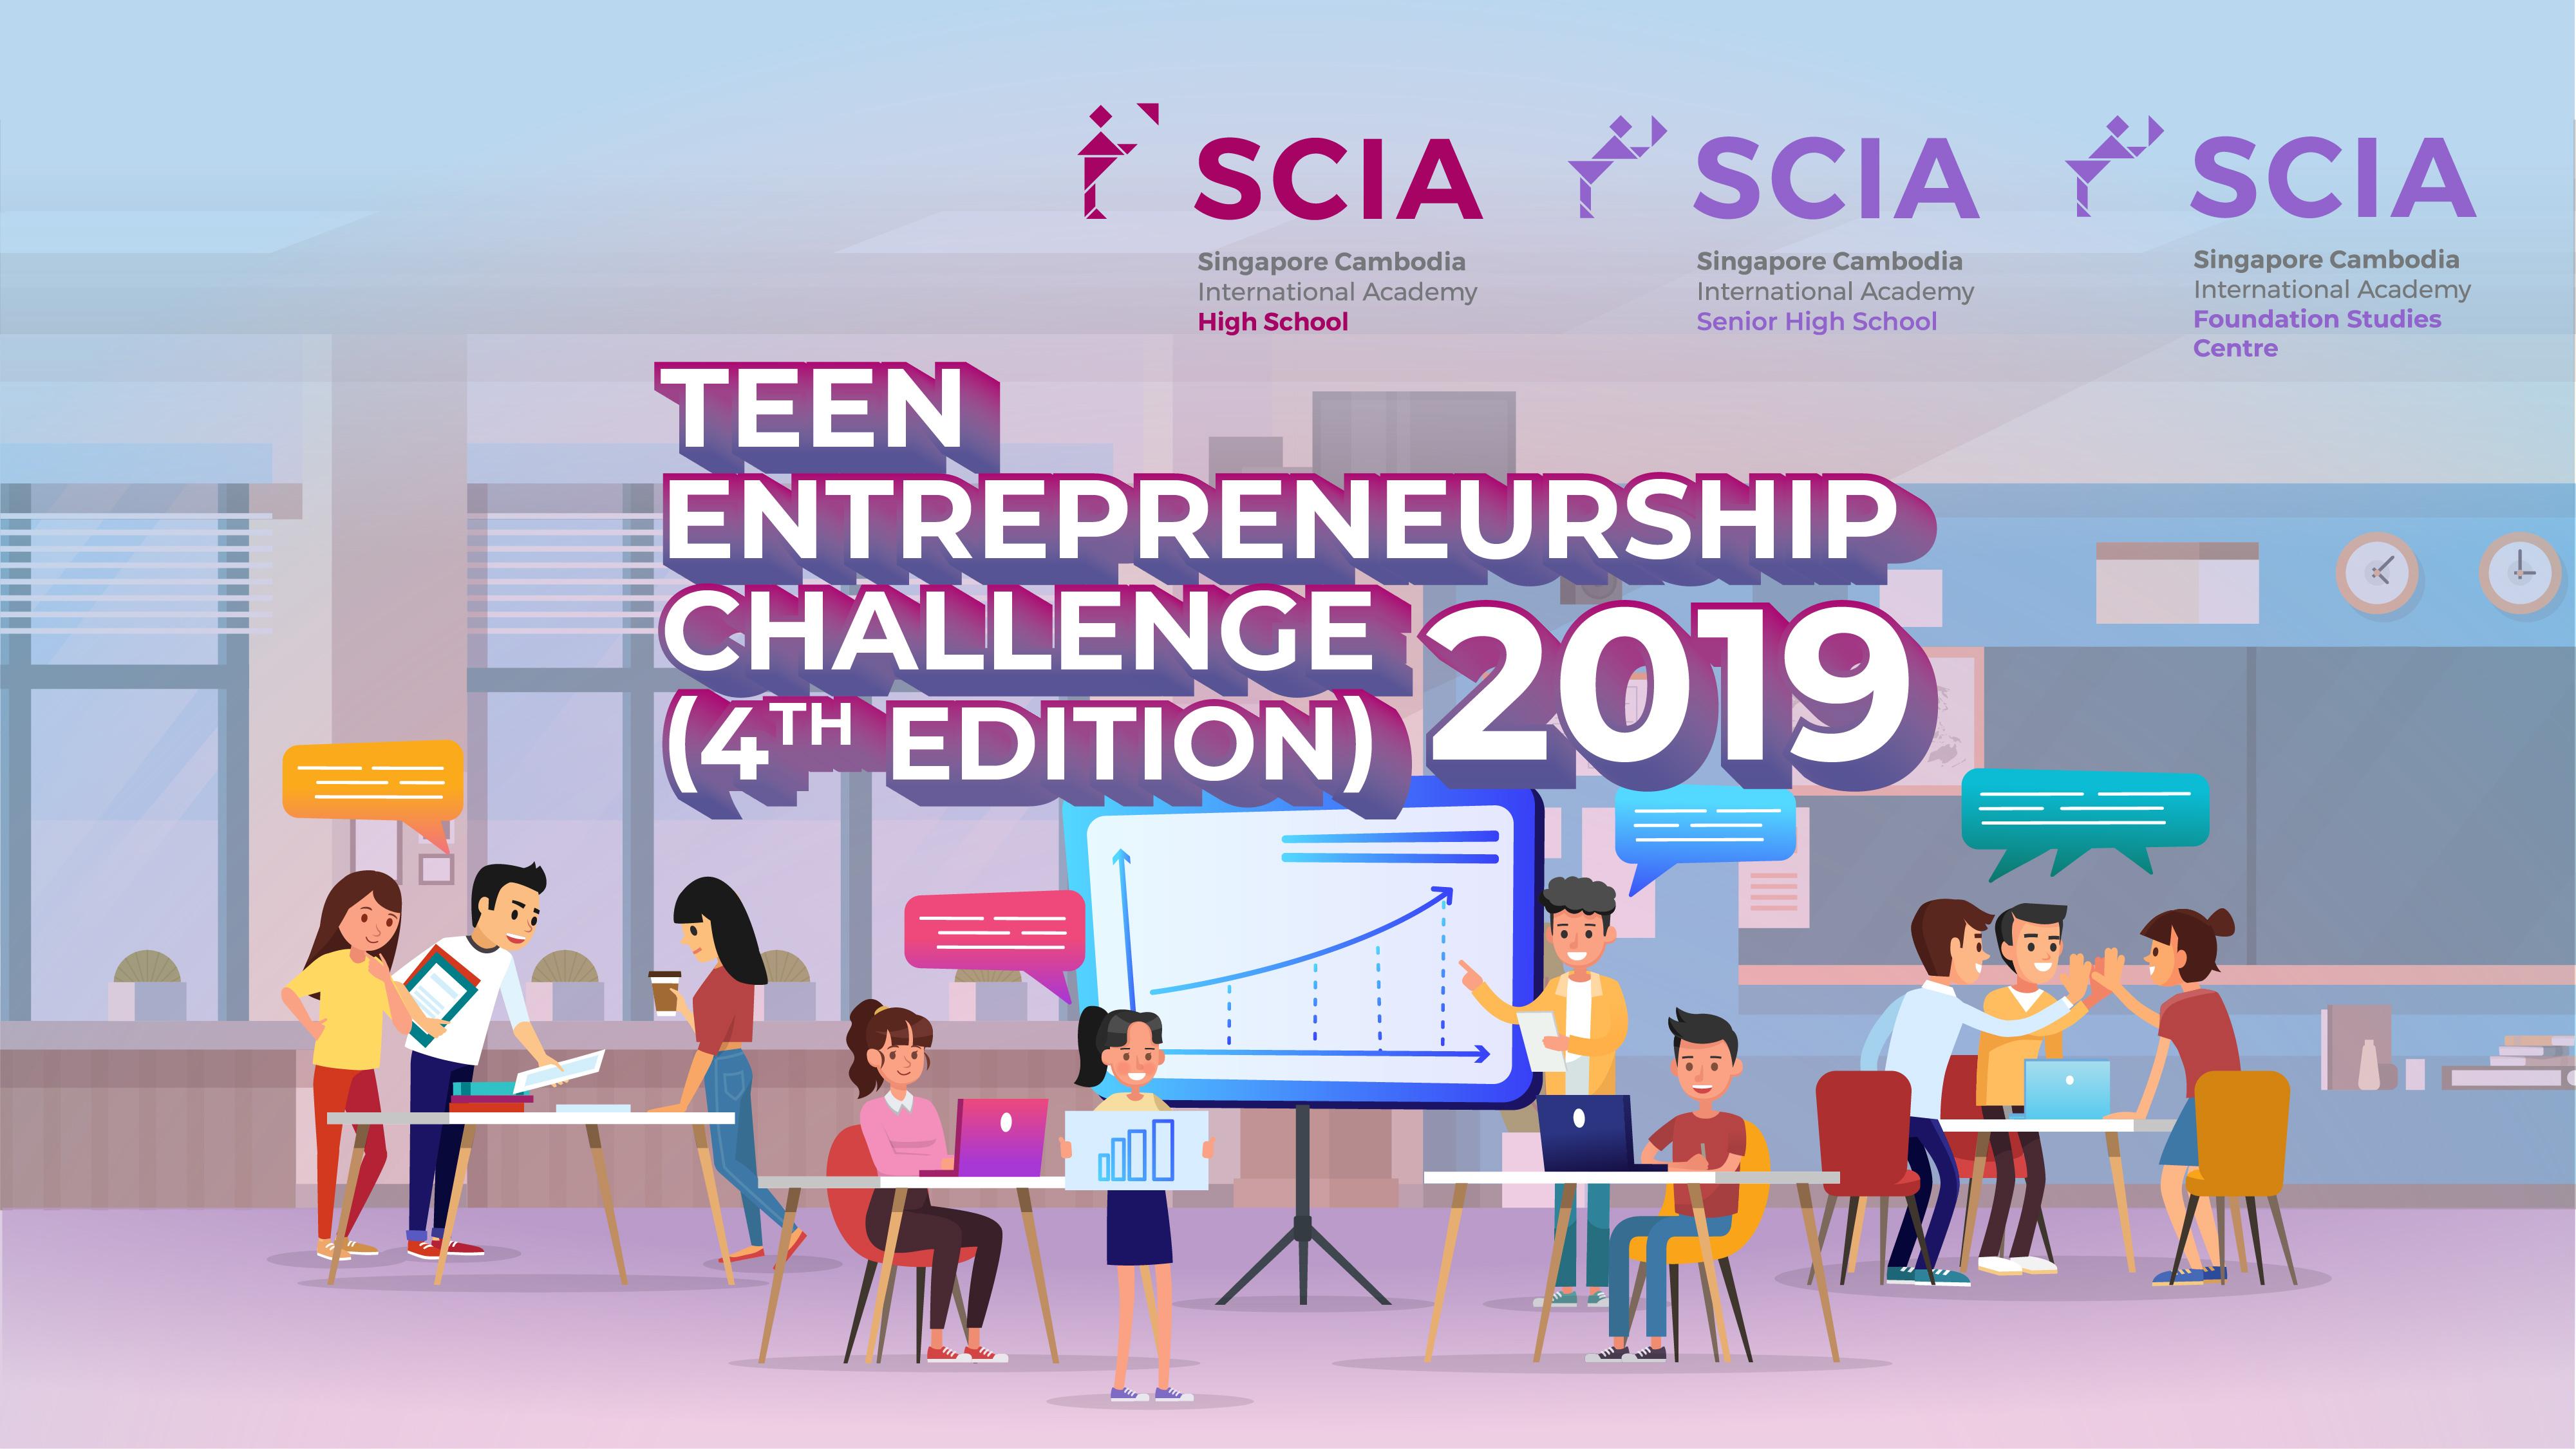 SCIA Teen Entrepreneurship Challenge (TEC) 2019: 4th Edition is BACK this November!